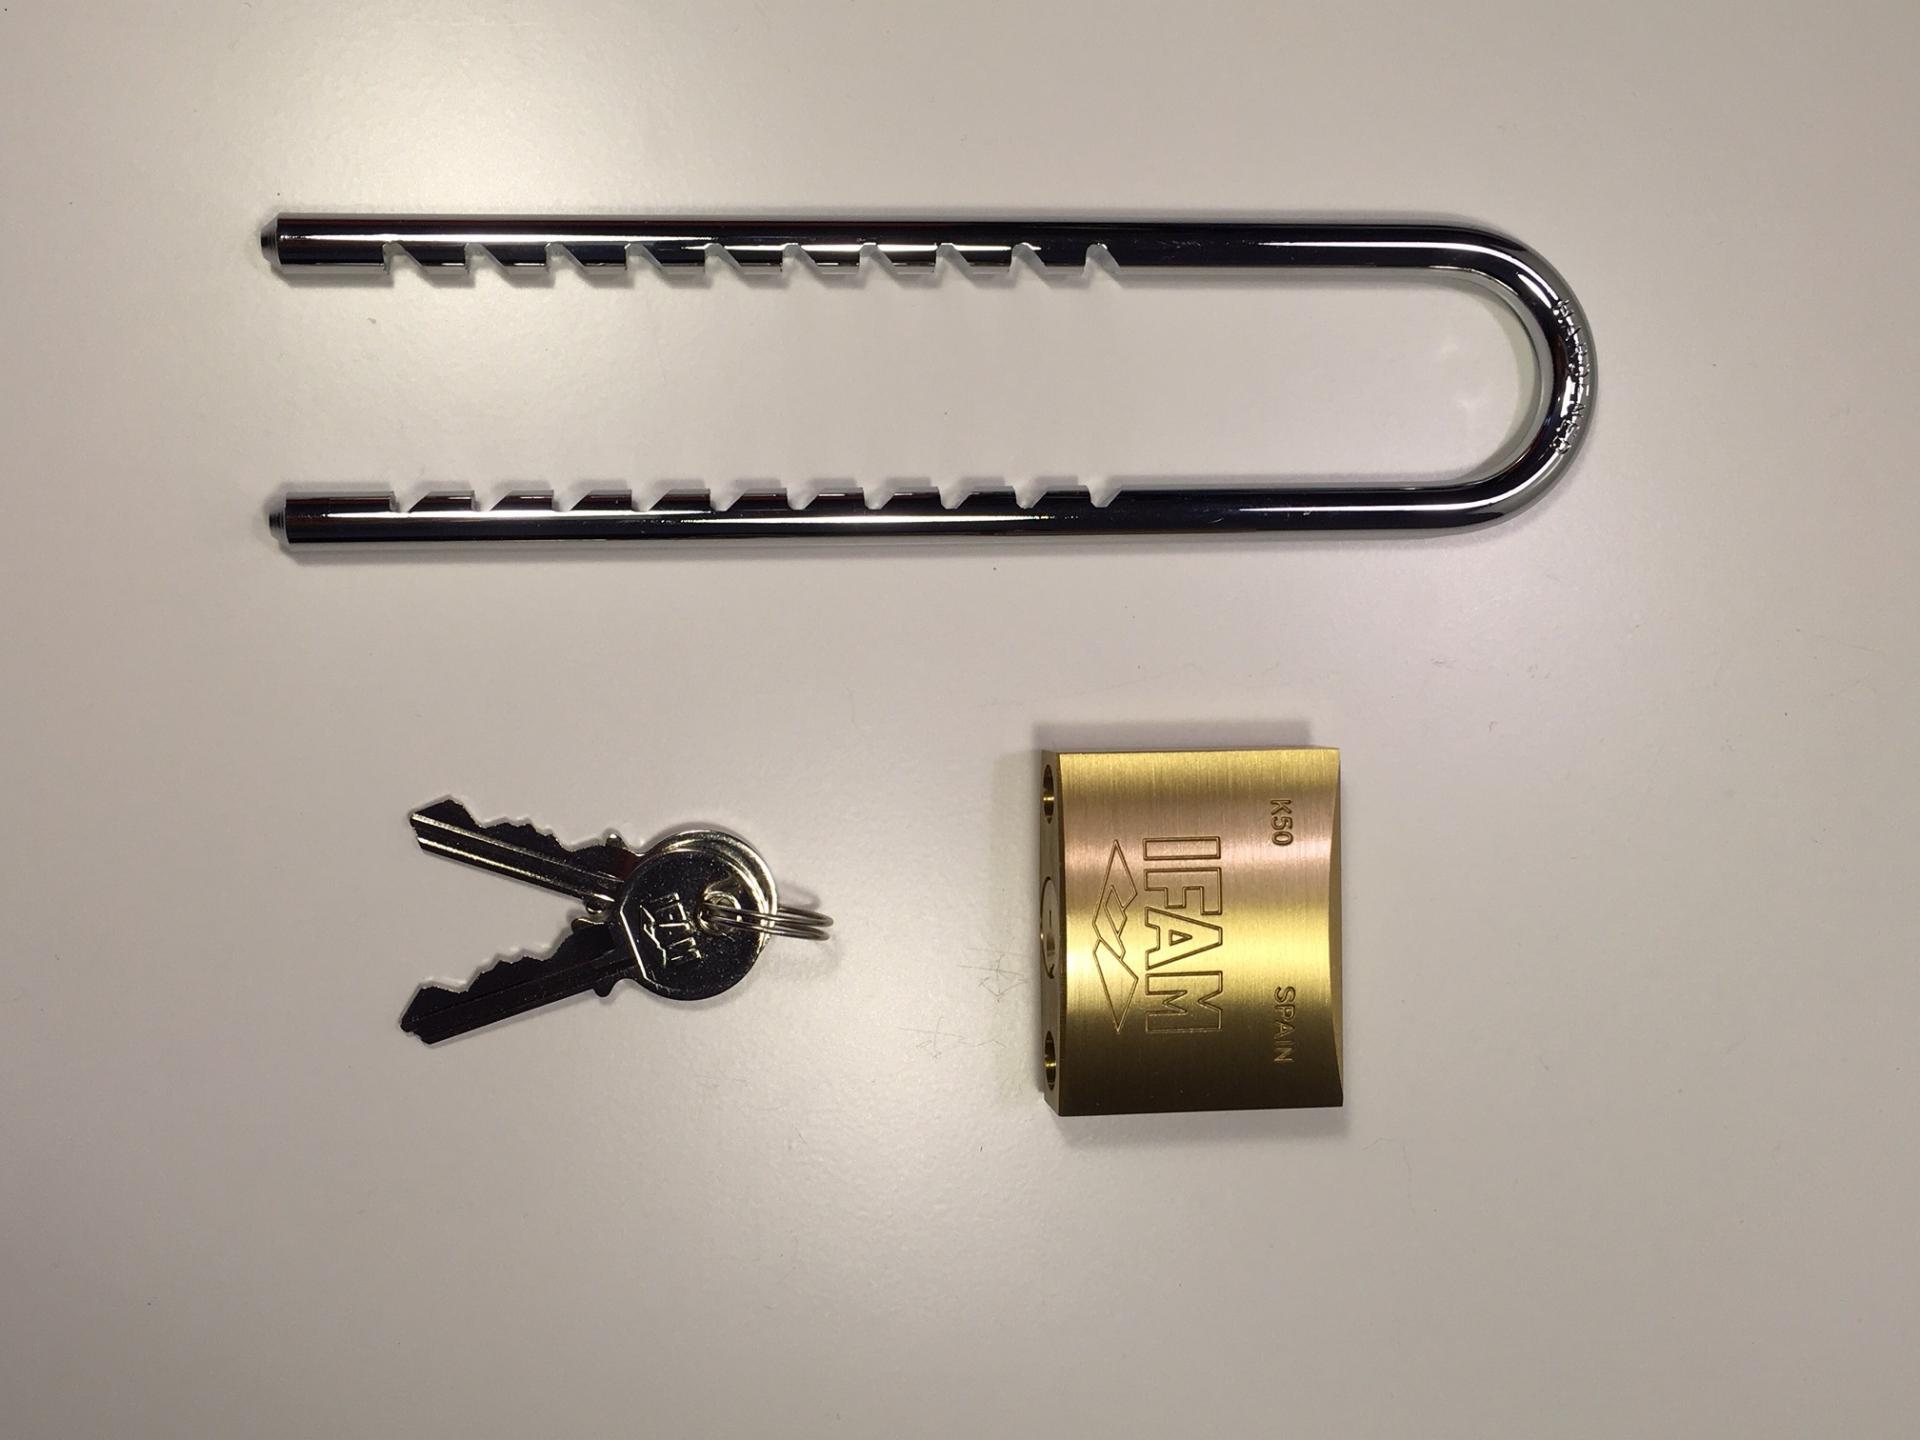 Cadenas 50 mm avec anse reglable ifam